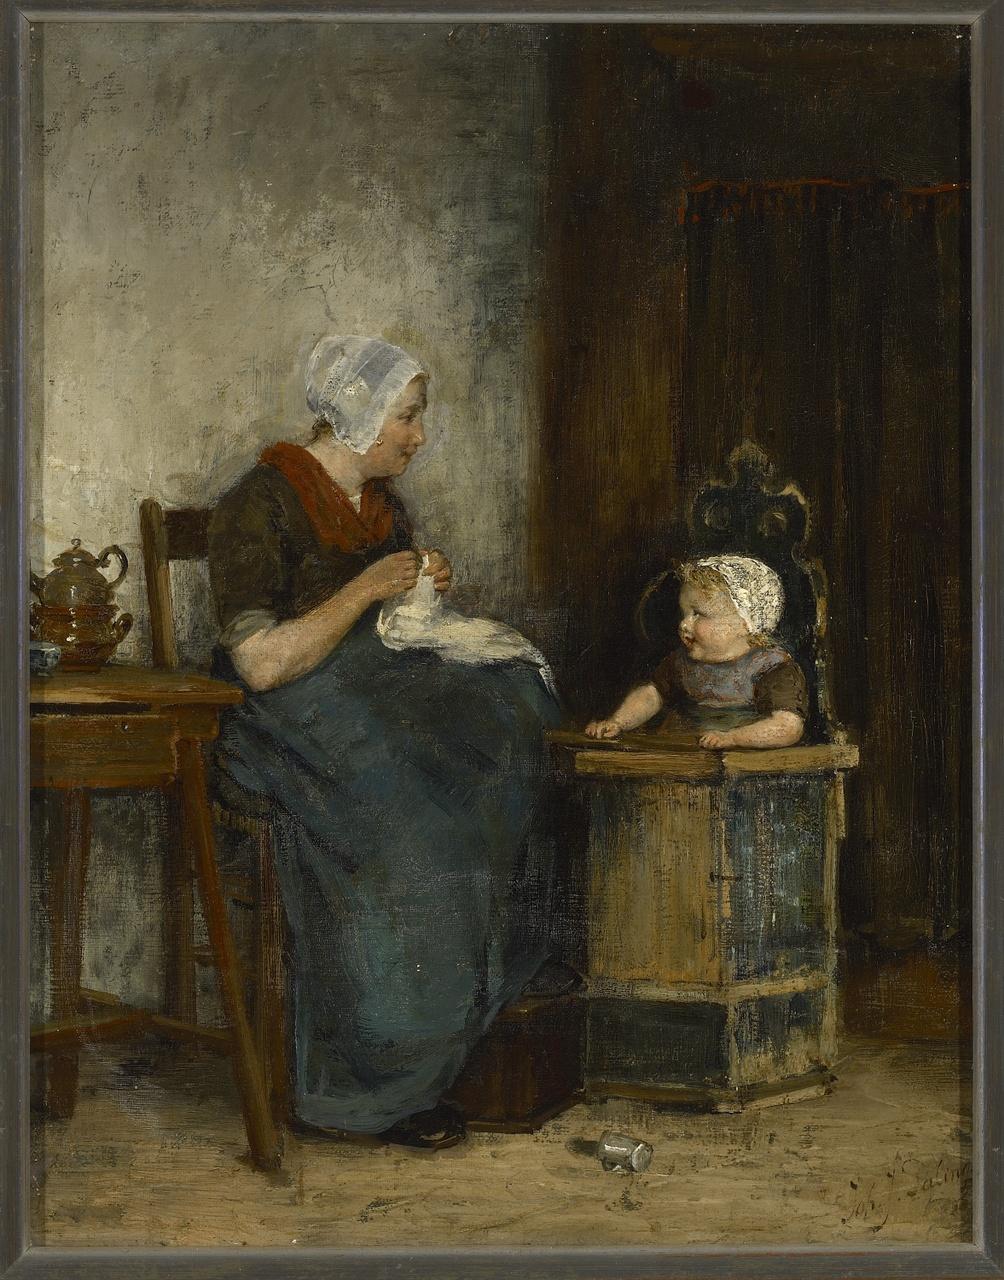 Moeder en kind, Johannes Jacobus Paling